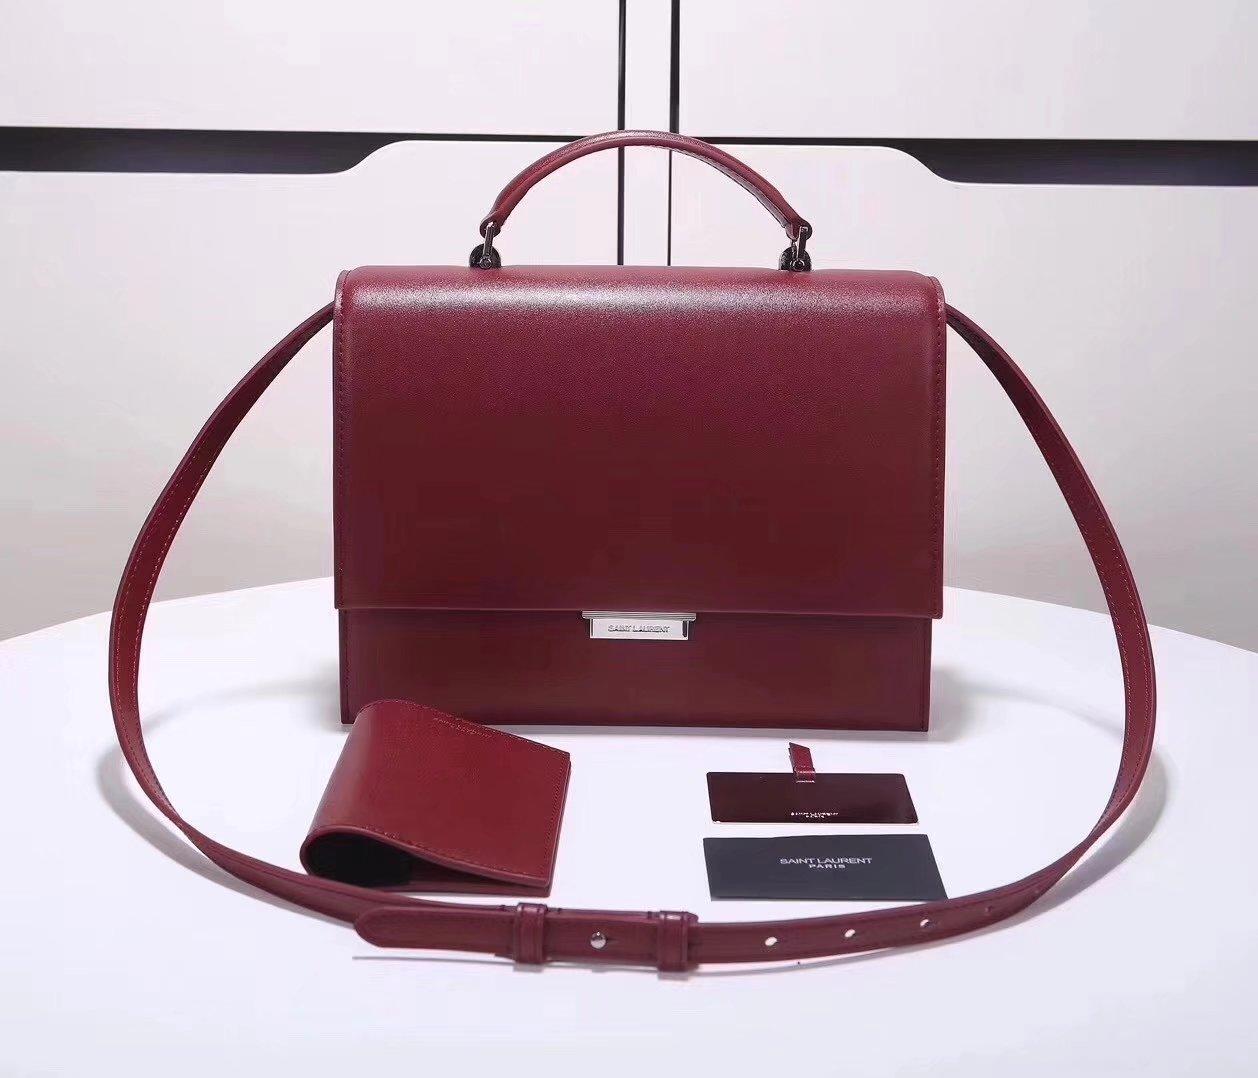 Saint Laurent Babylone Medium Top Handle Bag Red Leather